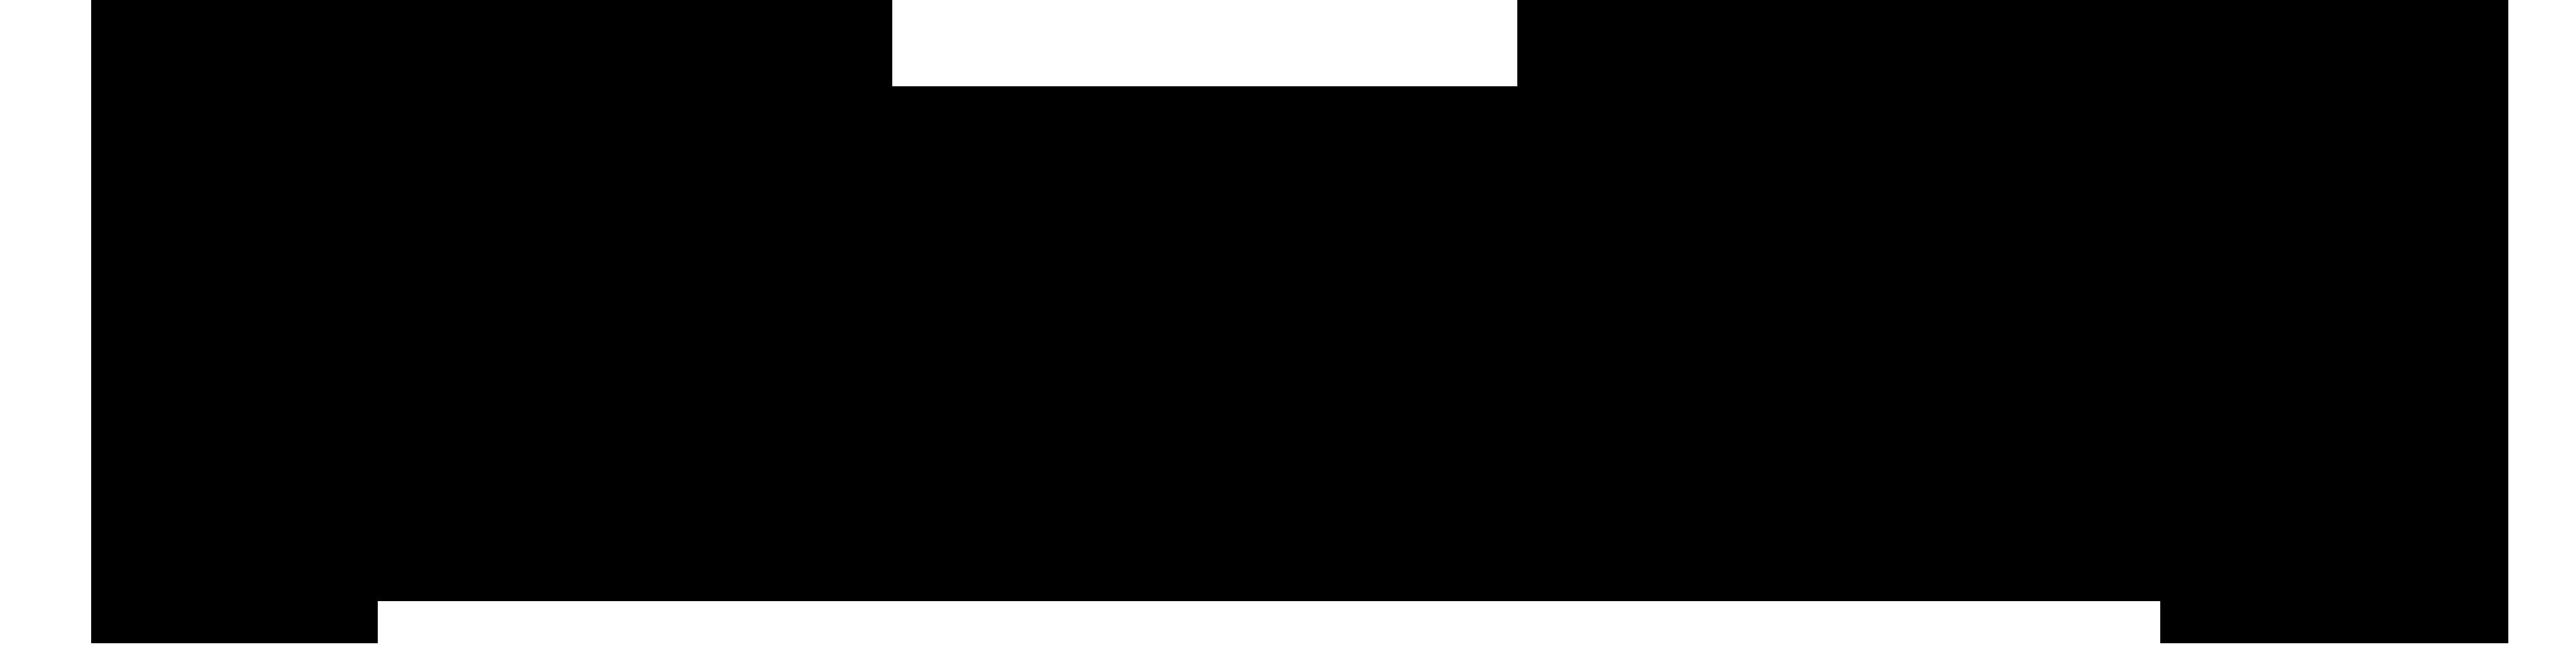 spalding-logo.png